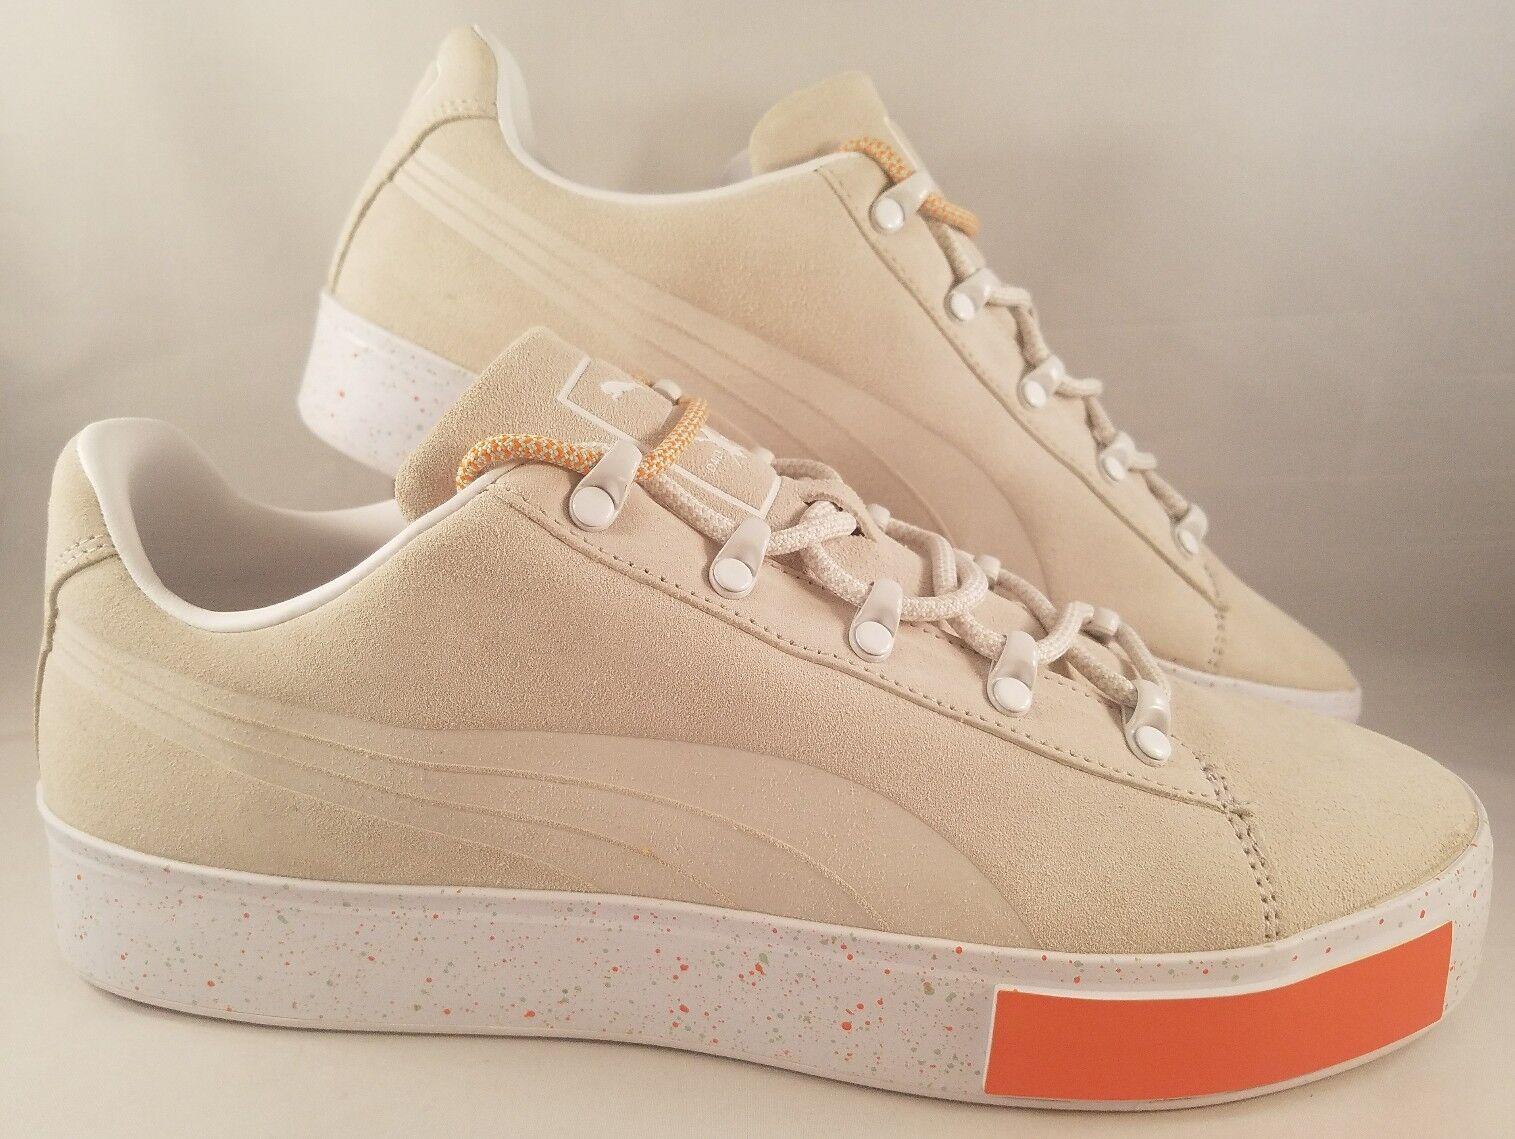 Puma Daily Paper Suede Shoes Men's Size 10 Cream White Orange Court Sneakers